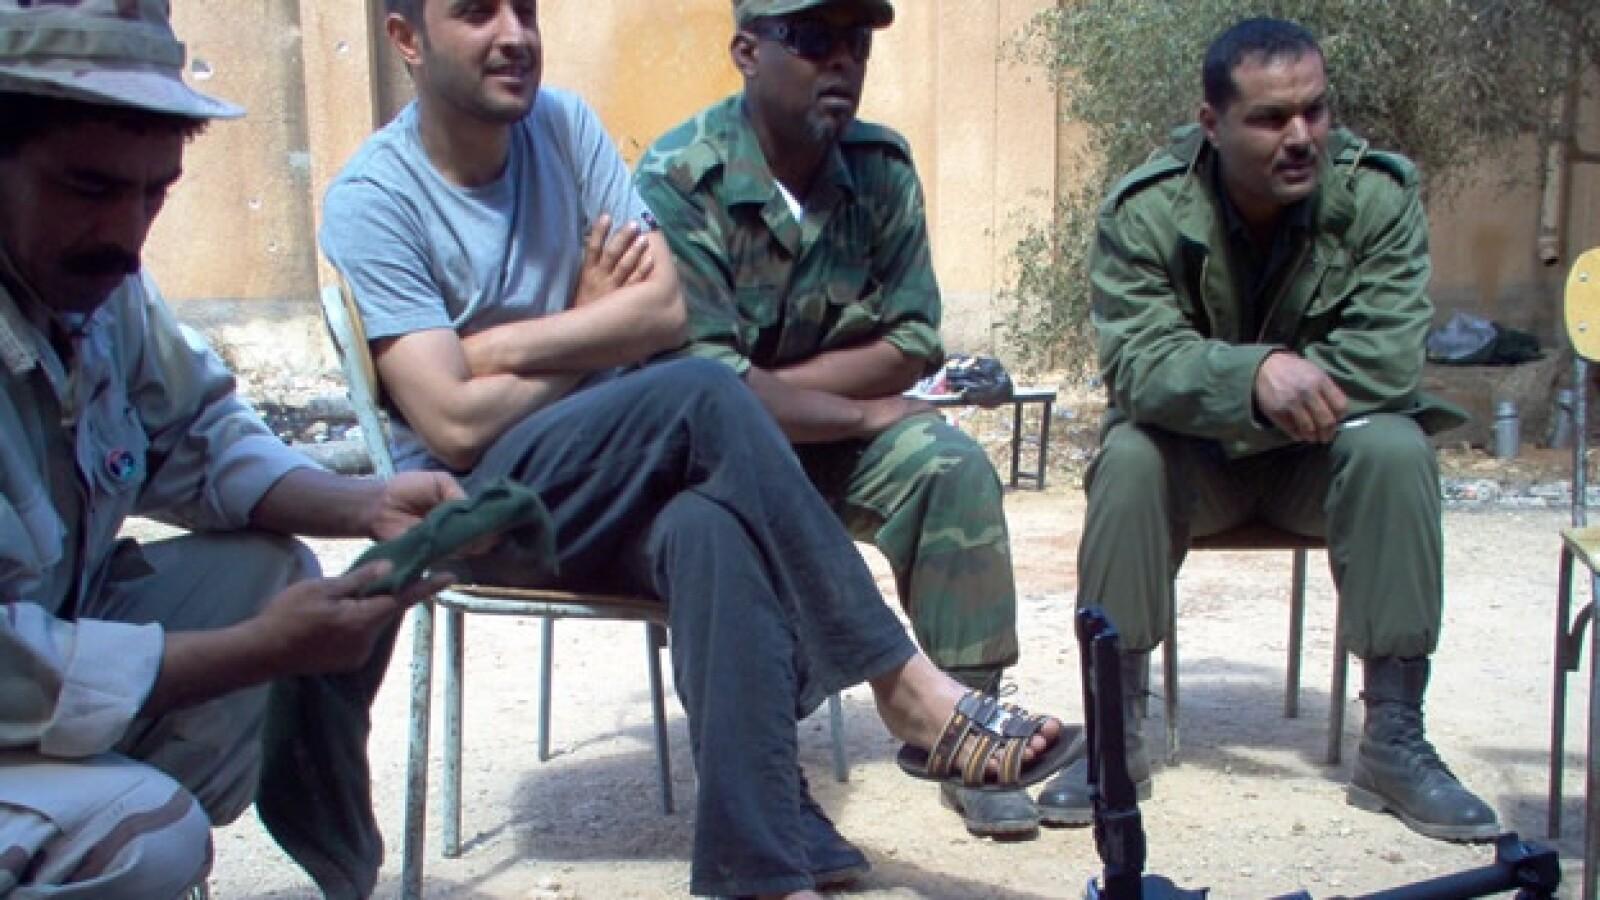 Libia - soldado de EU - grupo en clase